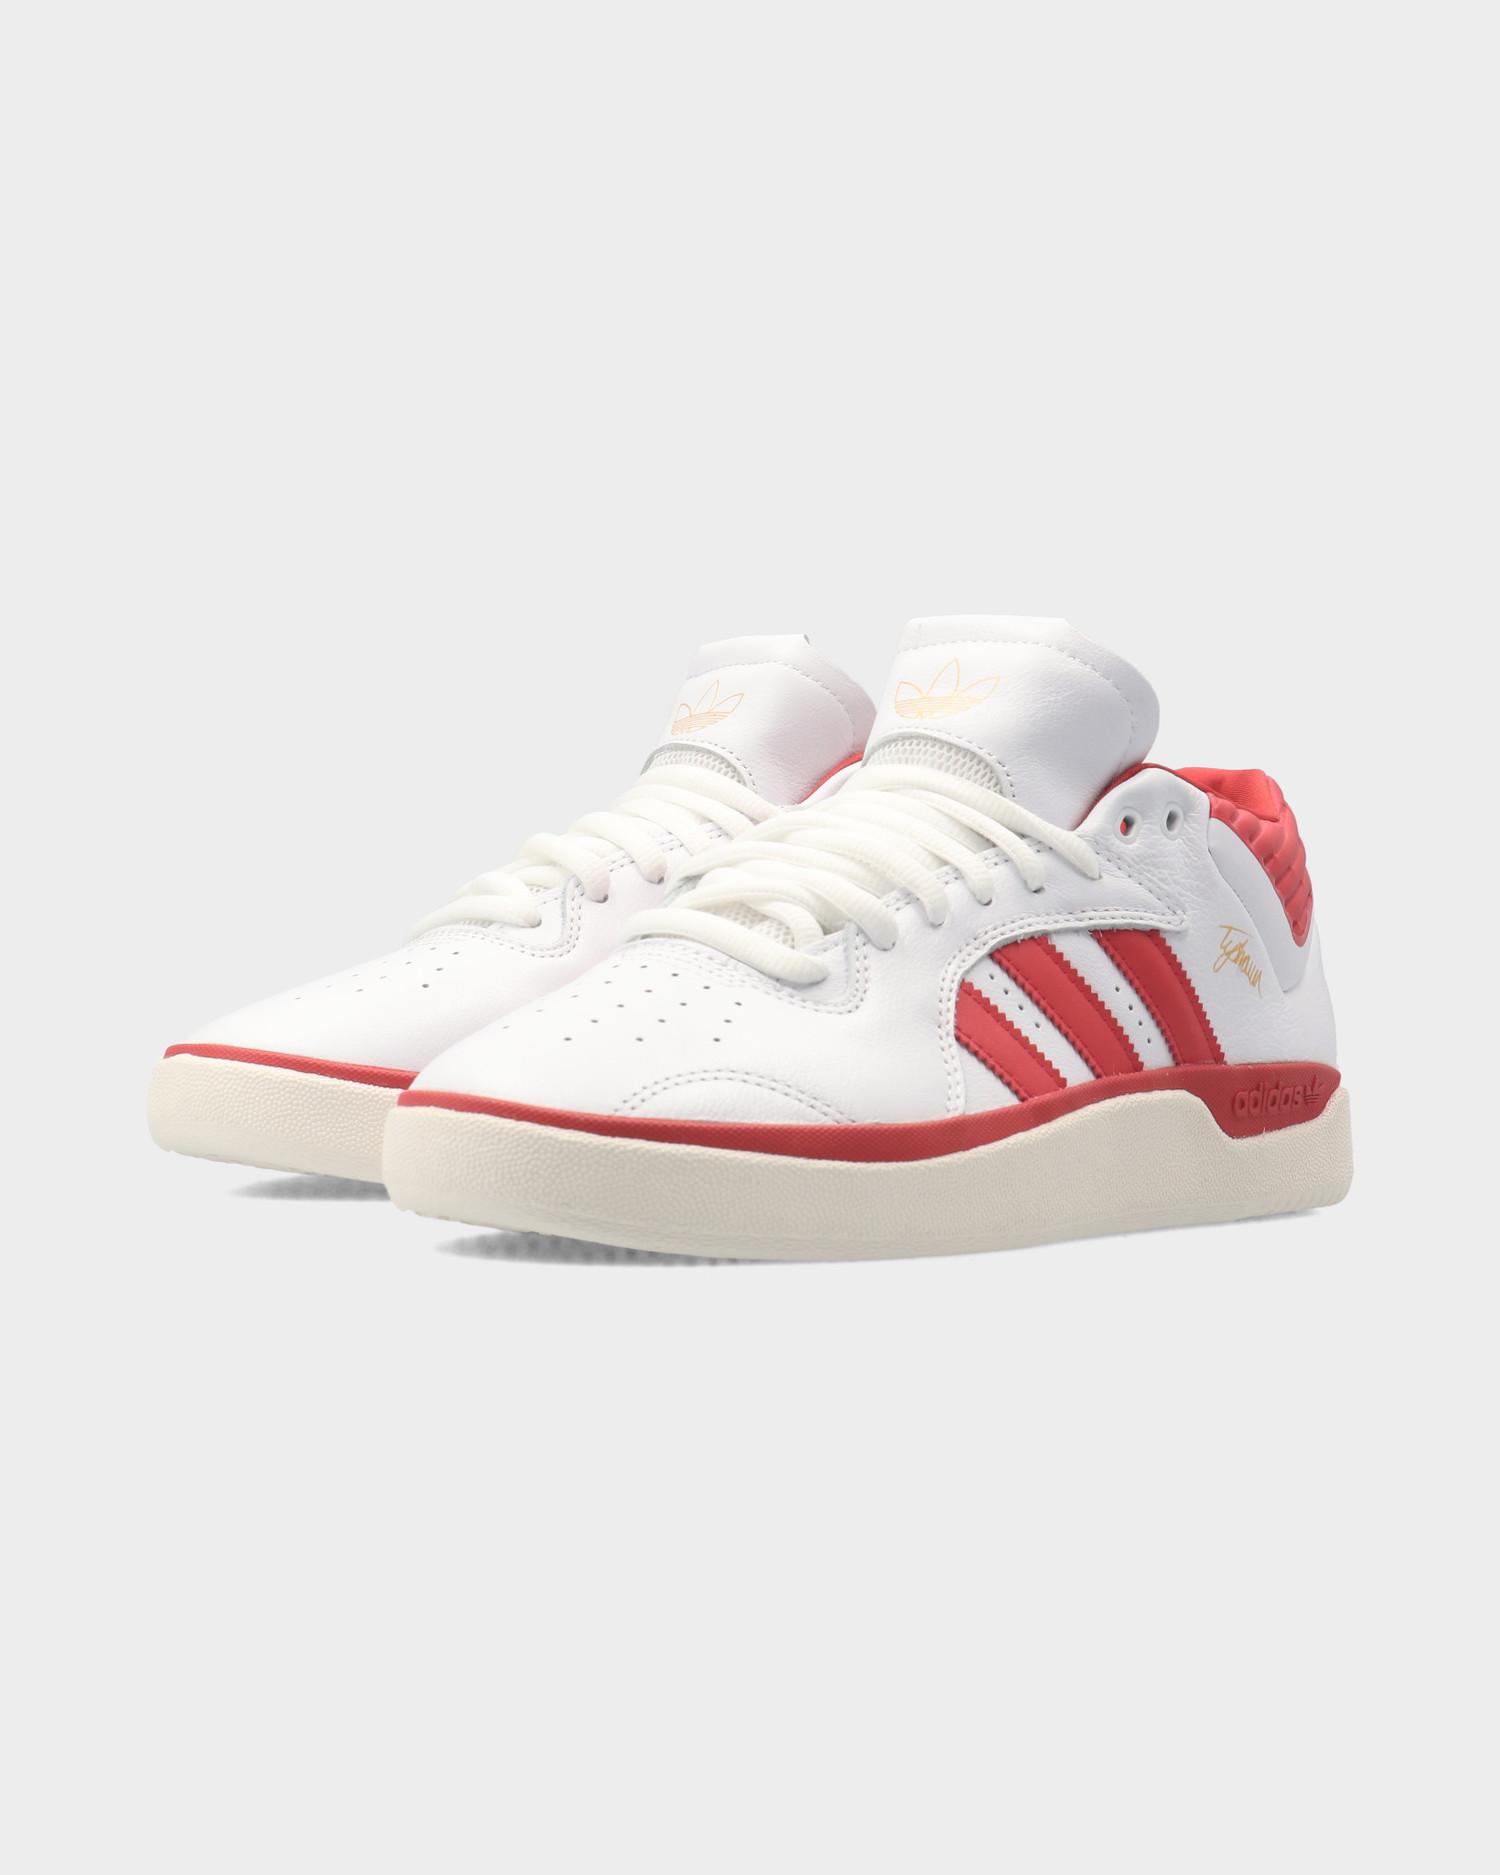 Adidas Tyshawn Mid Footwear White/Scarlet/Footwear White